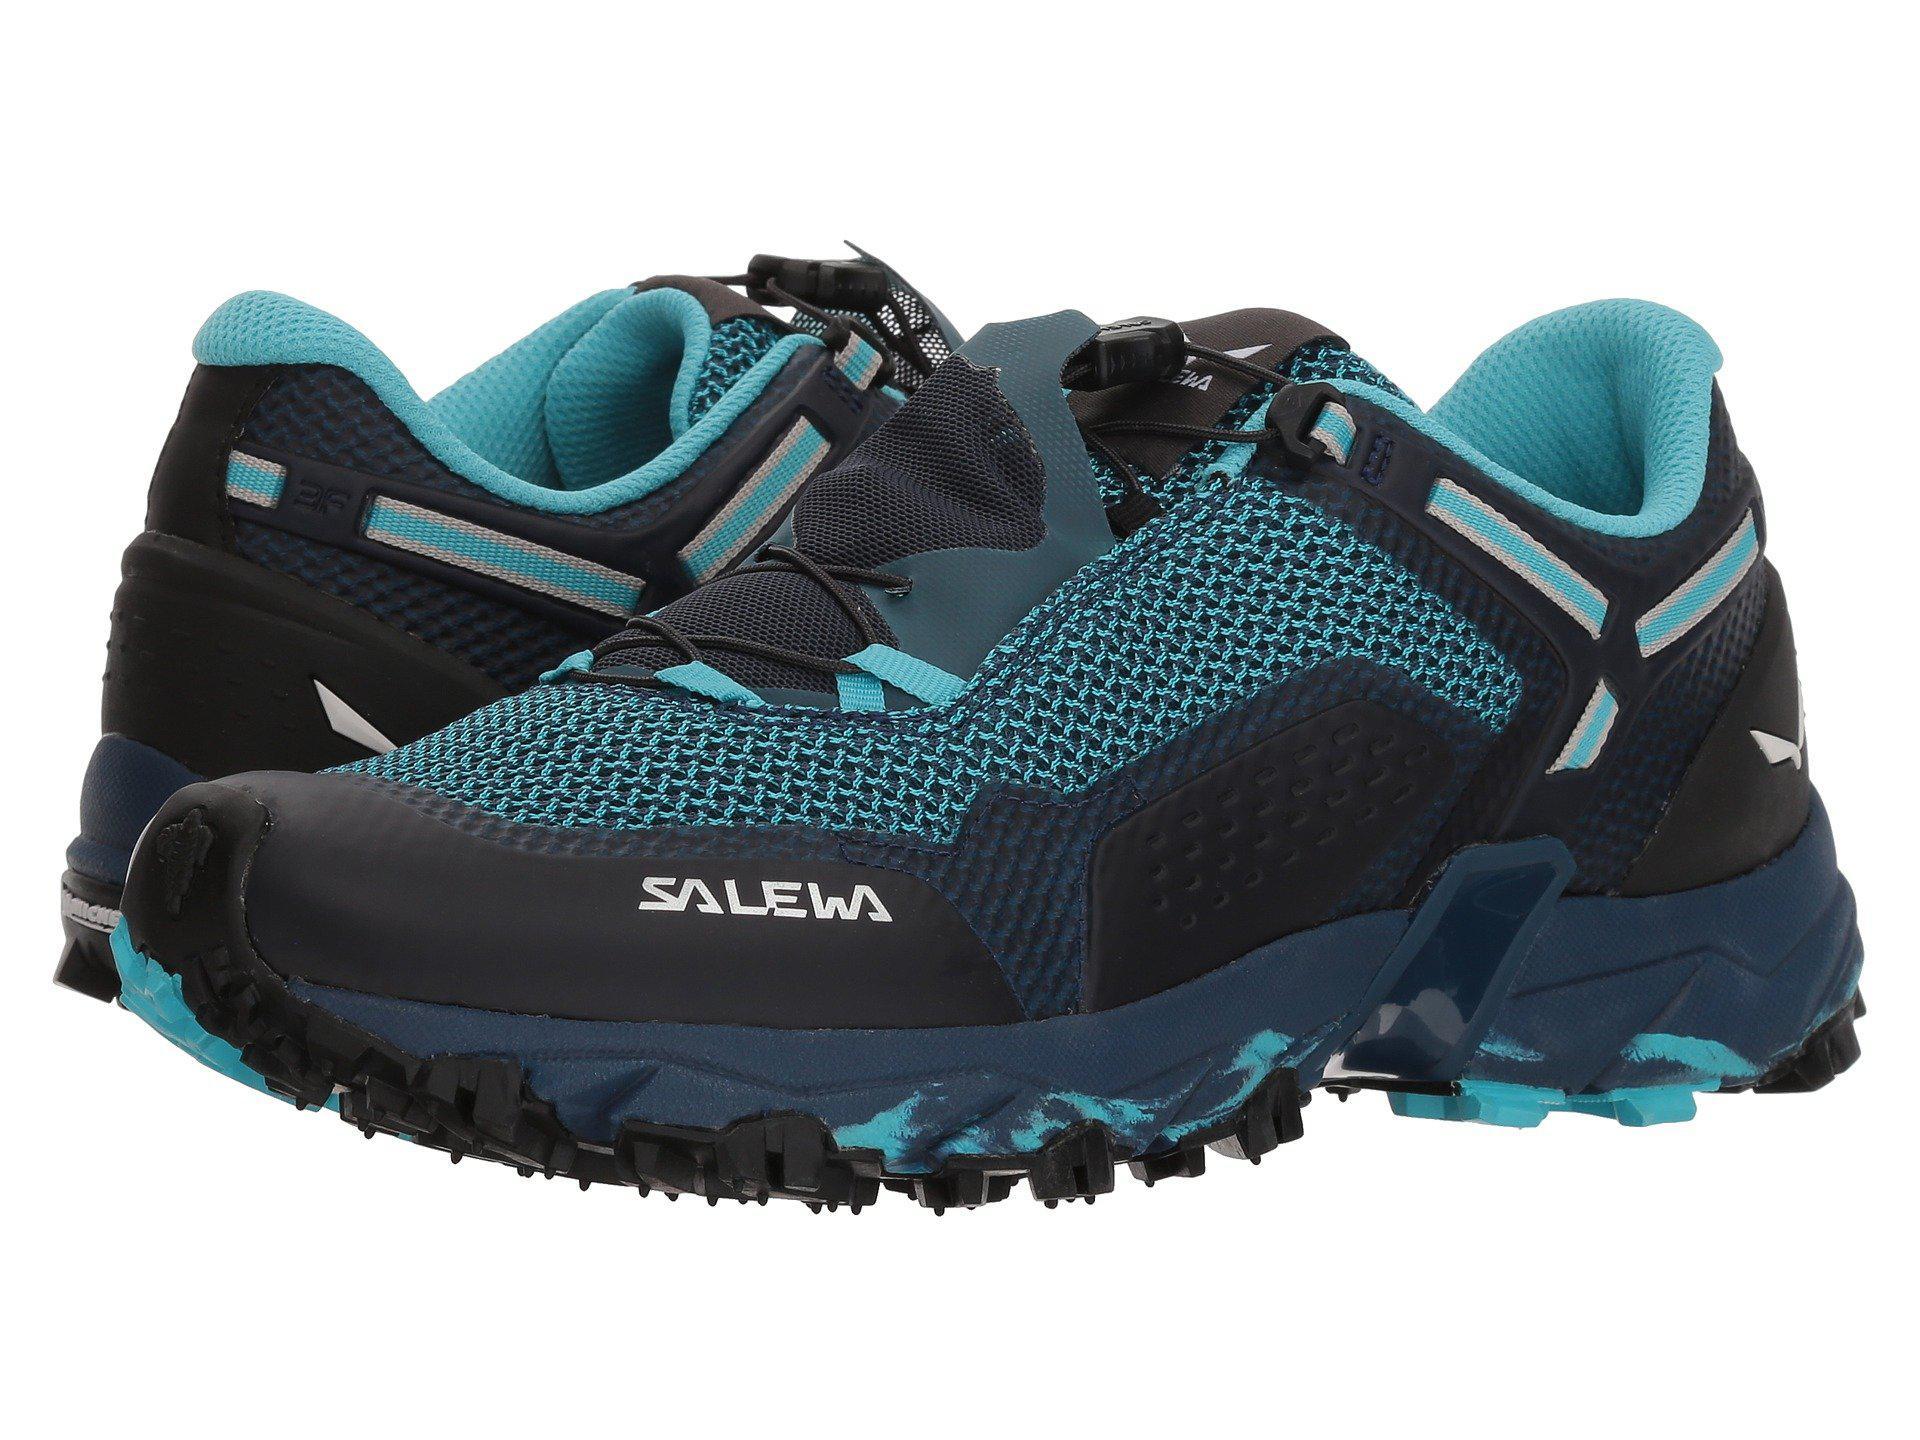 Ultra Blue 2 Shoes capriposeidon Women's Train In Salewa Lyst 5qxPU7w